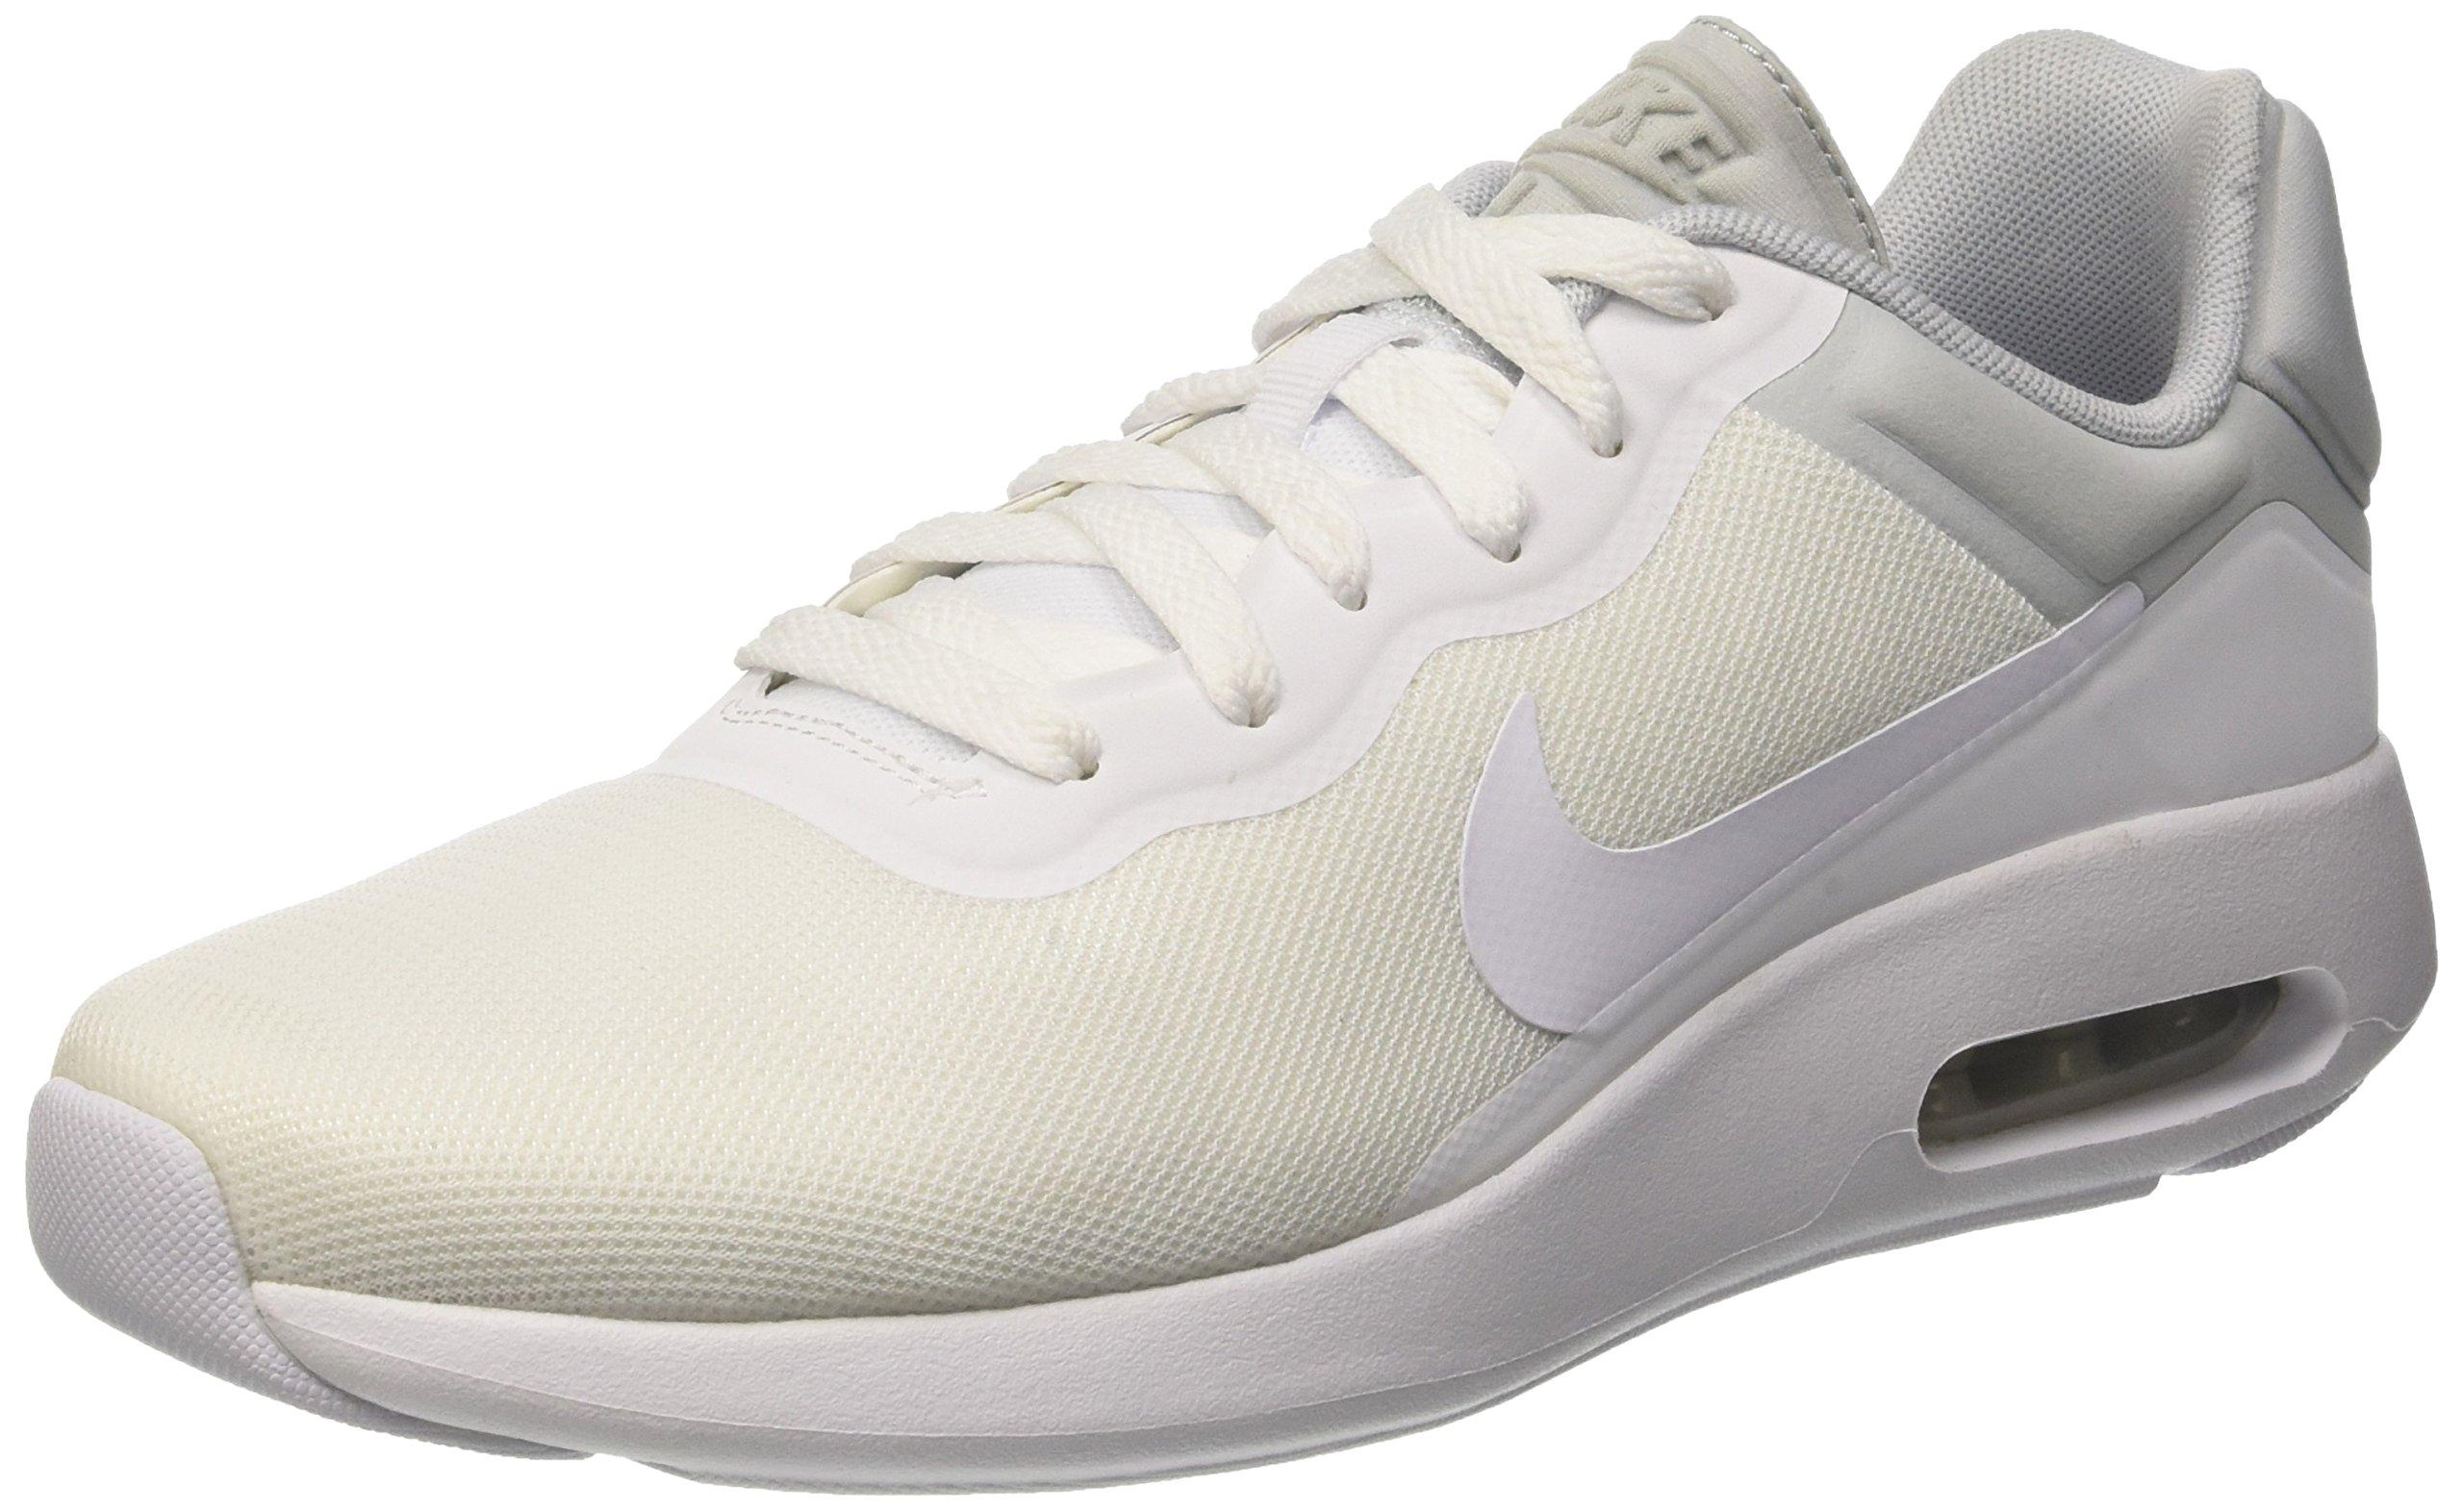 EssentialBaskets Max cool HommeBlanc pure Grey Modern White Nike Eu Cassé Air Platinum43 QtdsrxhC